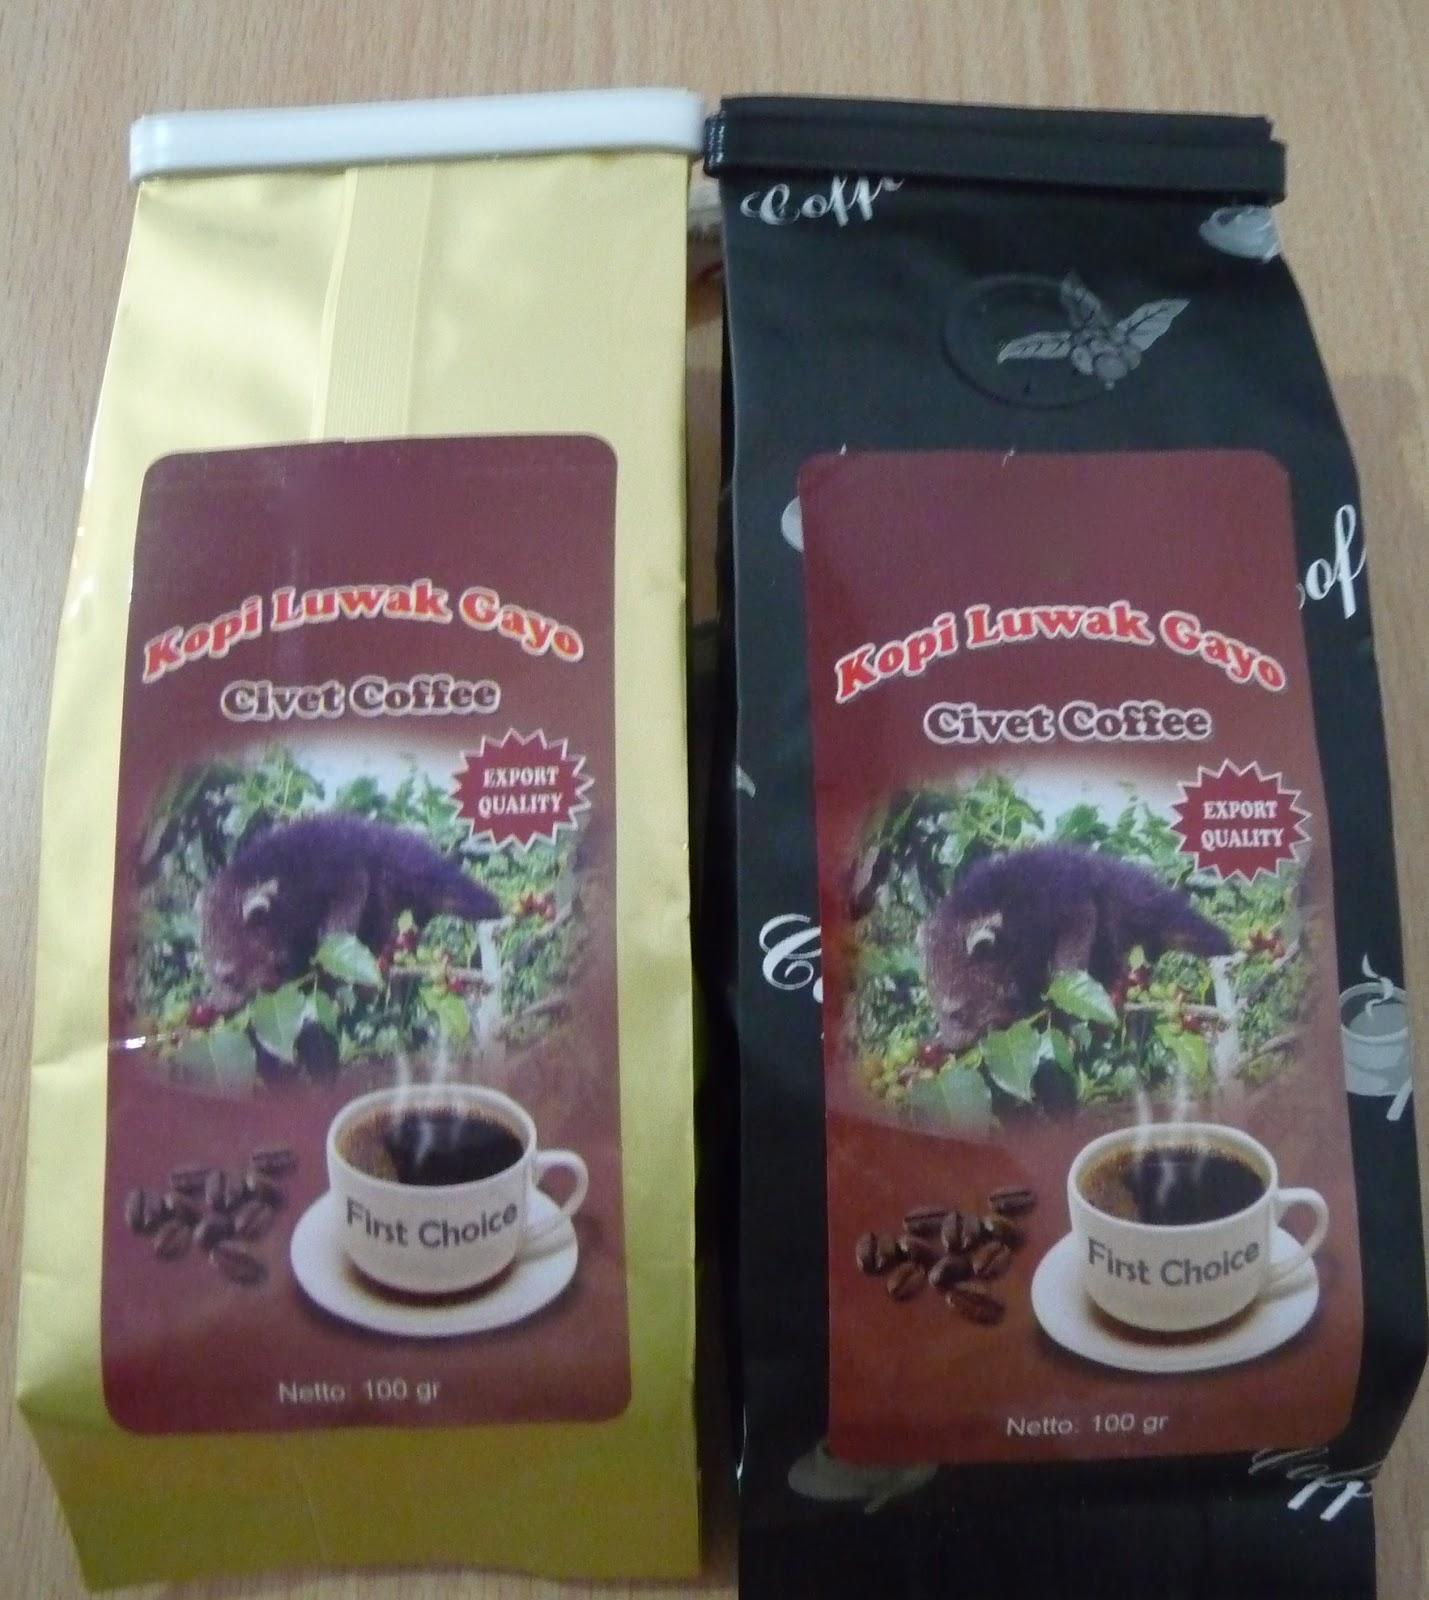 Civet Coffee Kopi Luwak From Firebox Packaging Lembah Cimanong 250 Gram By Arabica 100g Powder 100 Grams